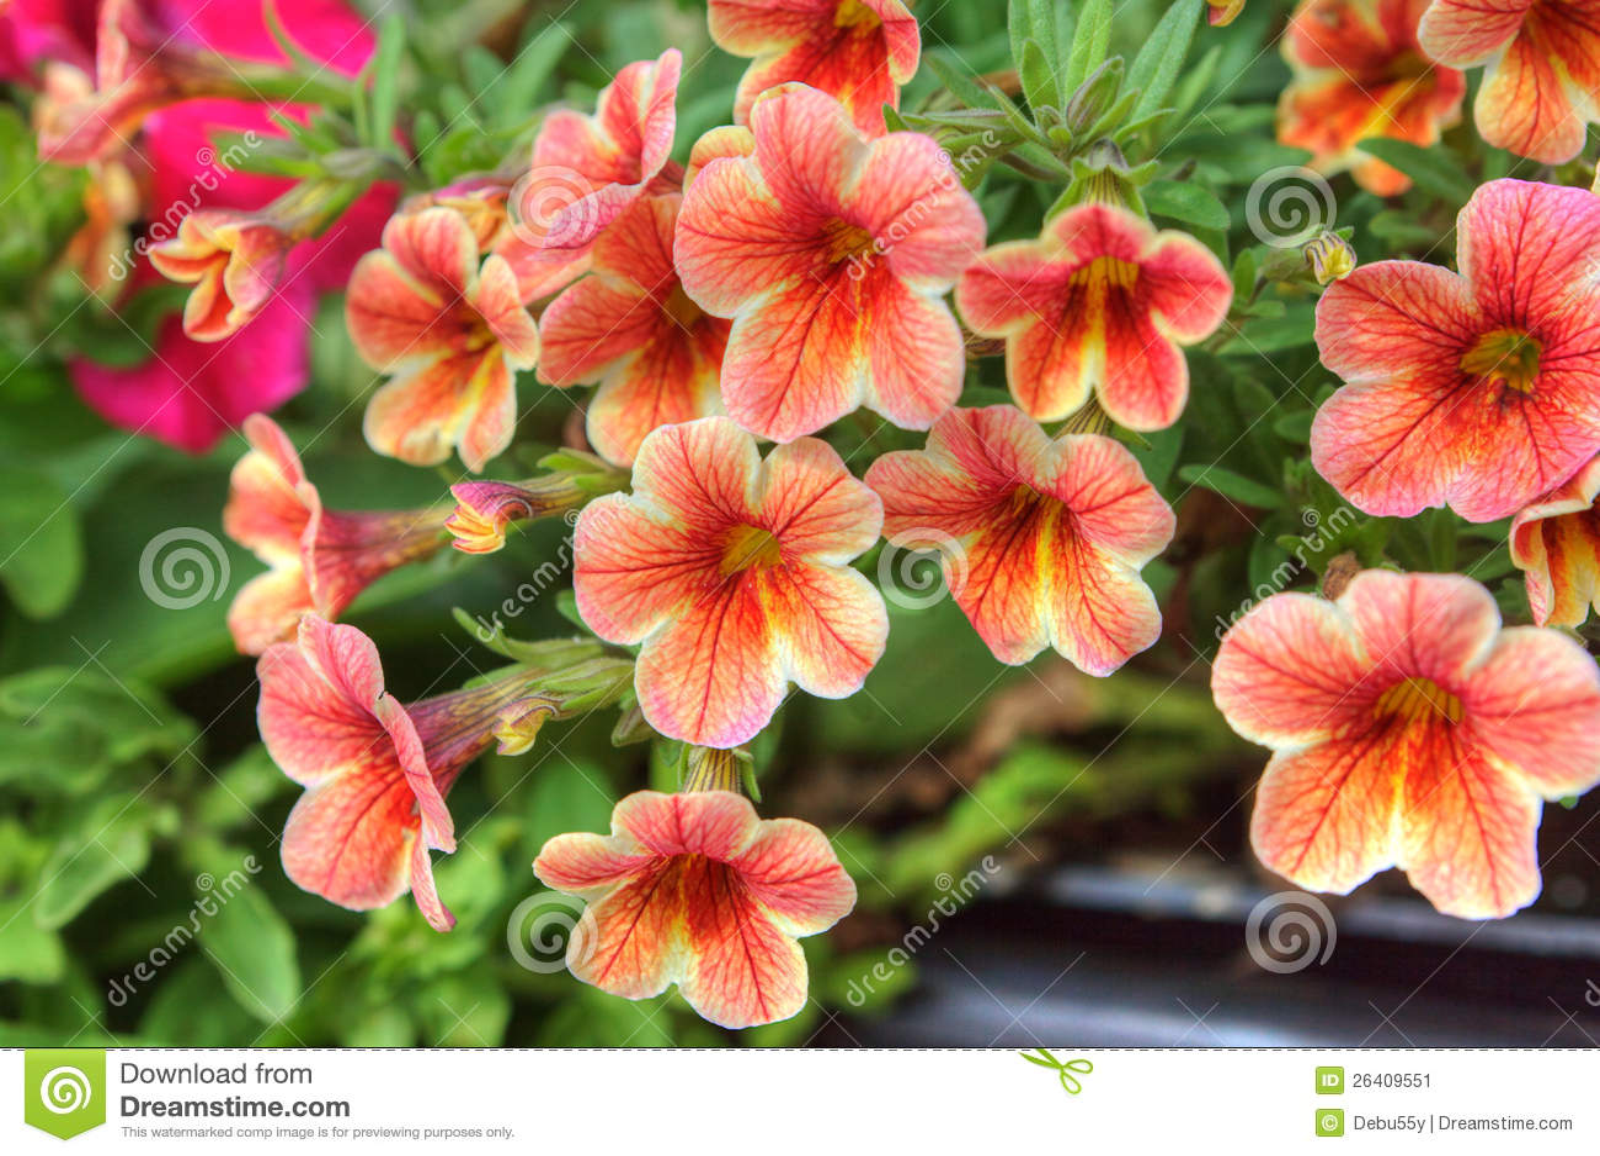 Orange Petunia Flowers Stock Image Image Of Flowering